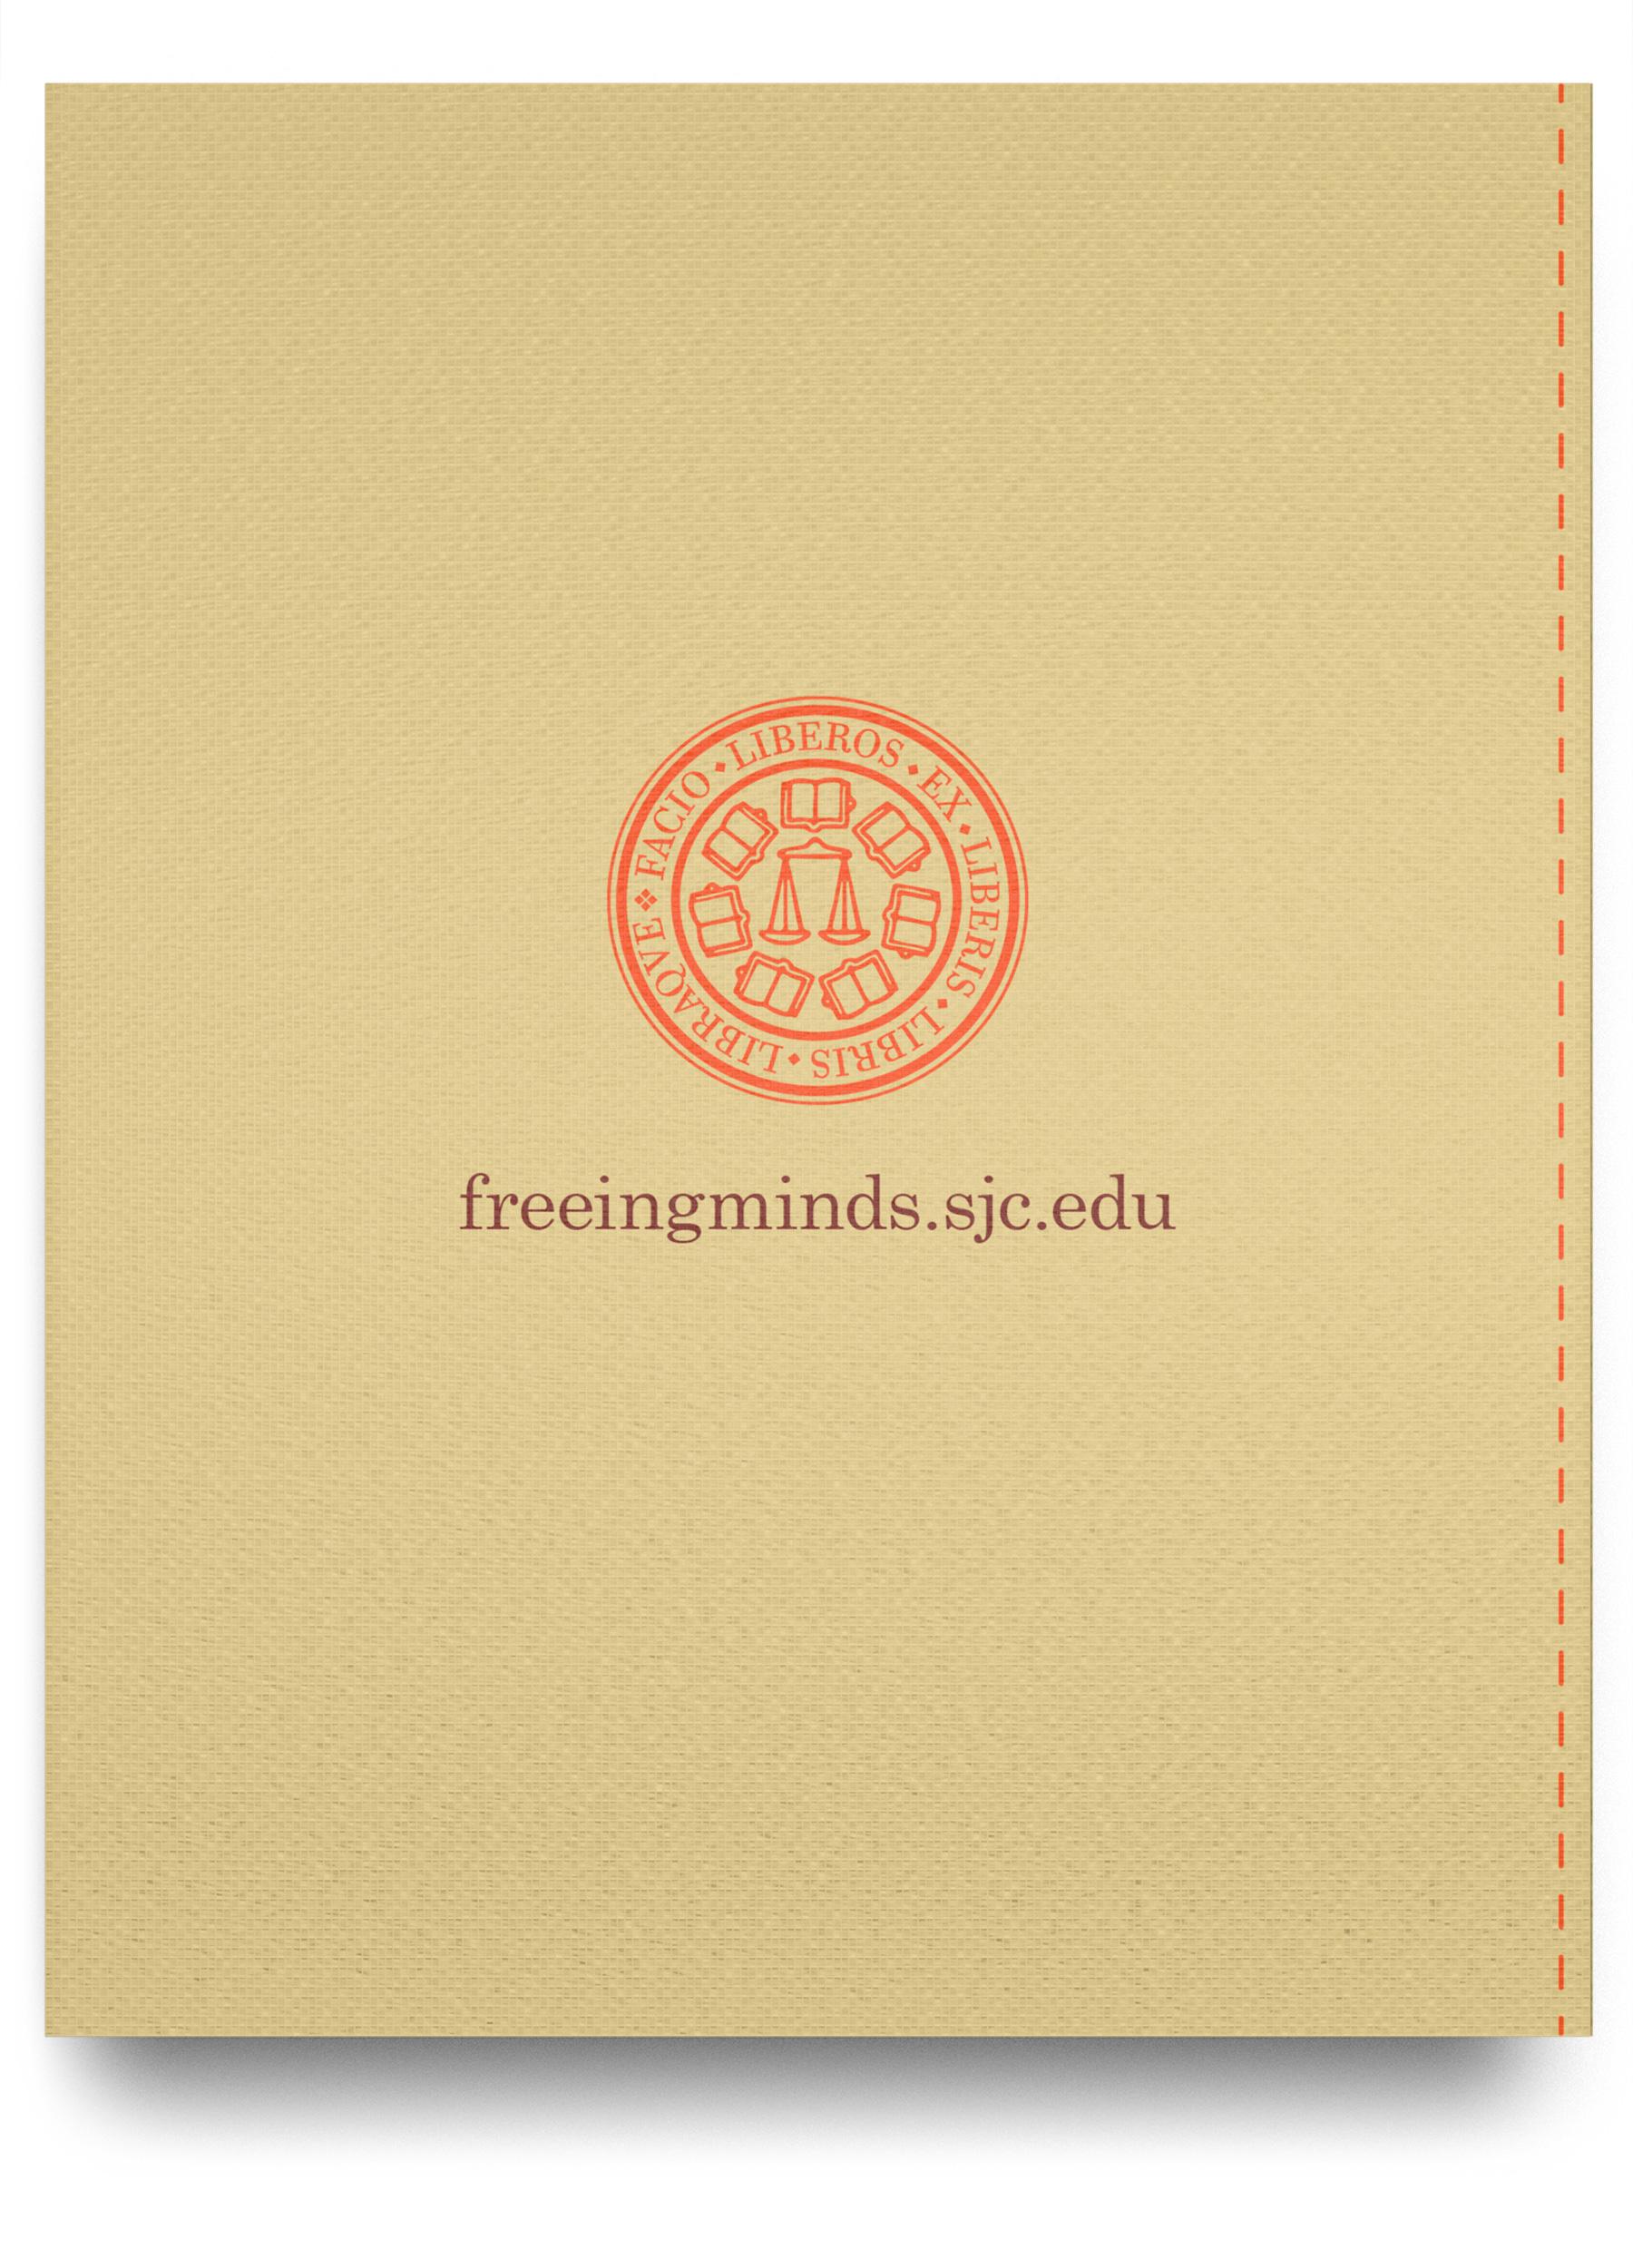 distinc_Portfolio_SCJ_Freeing_Minds_Report_Back_01_005.jpg